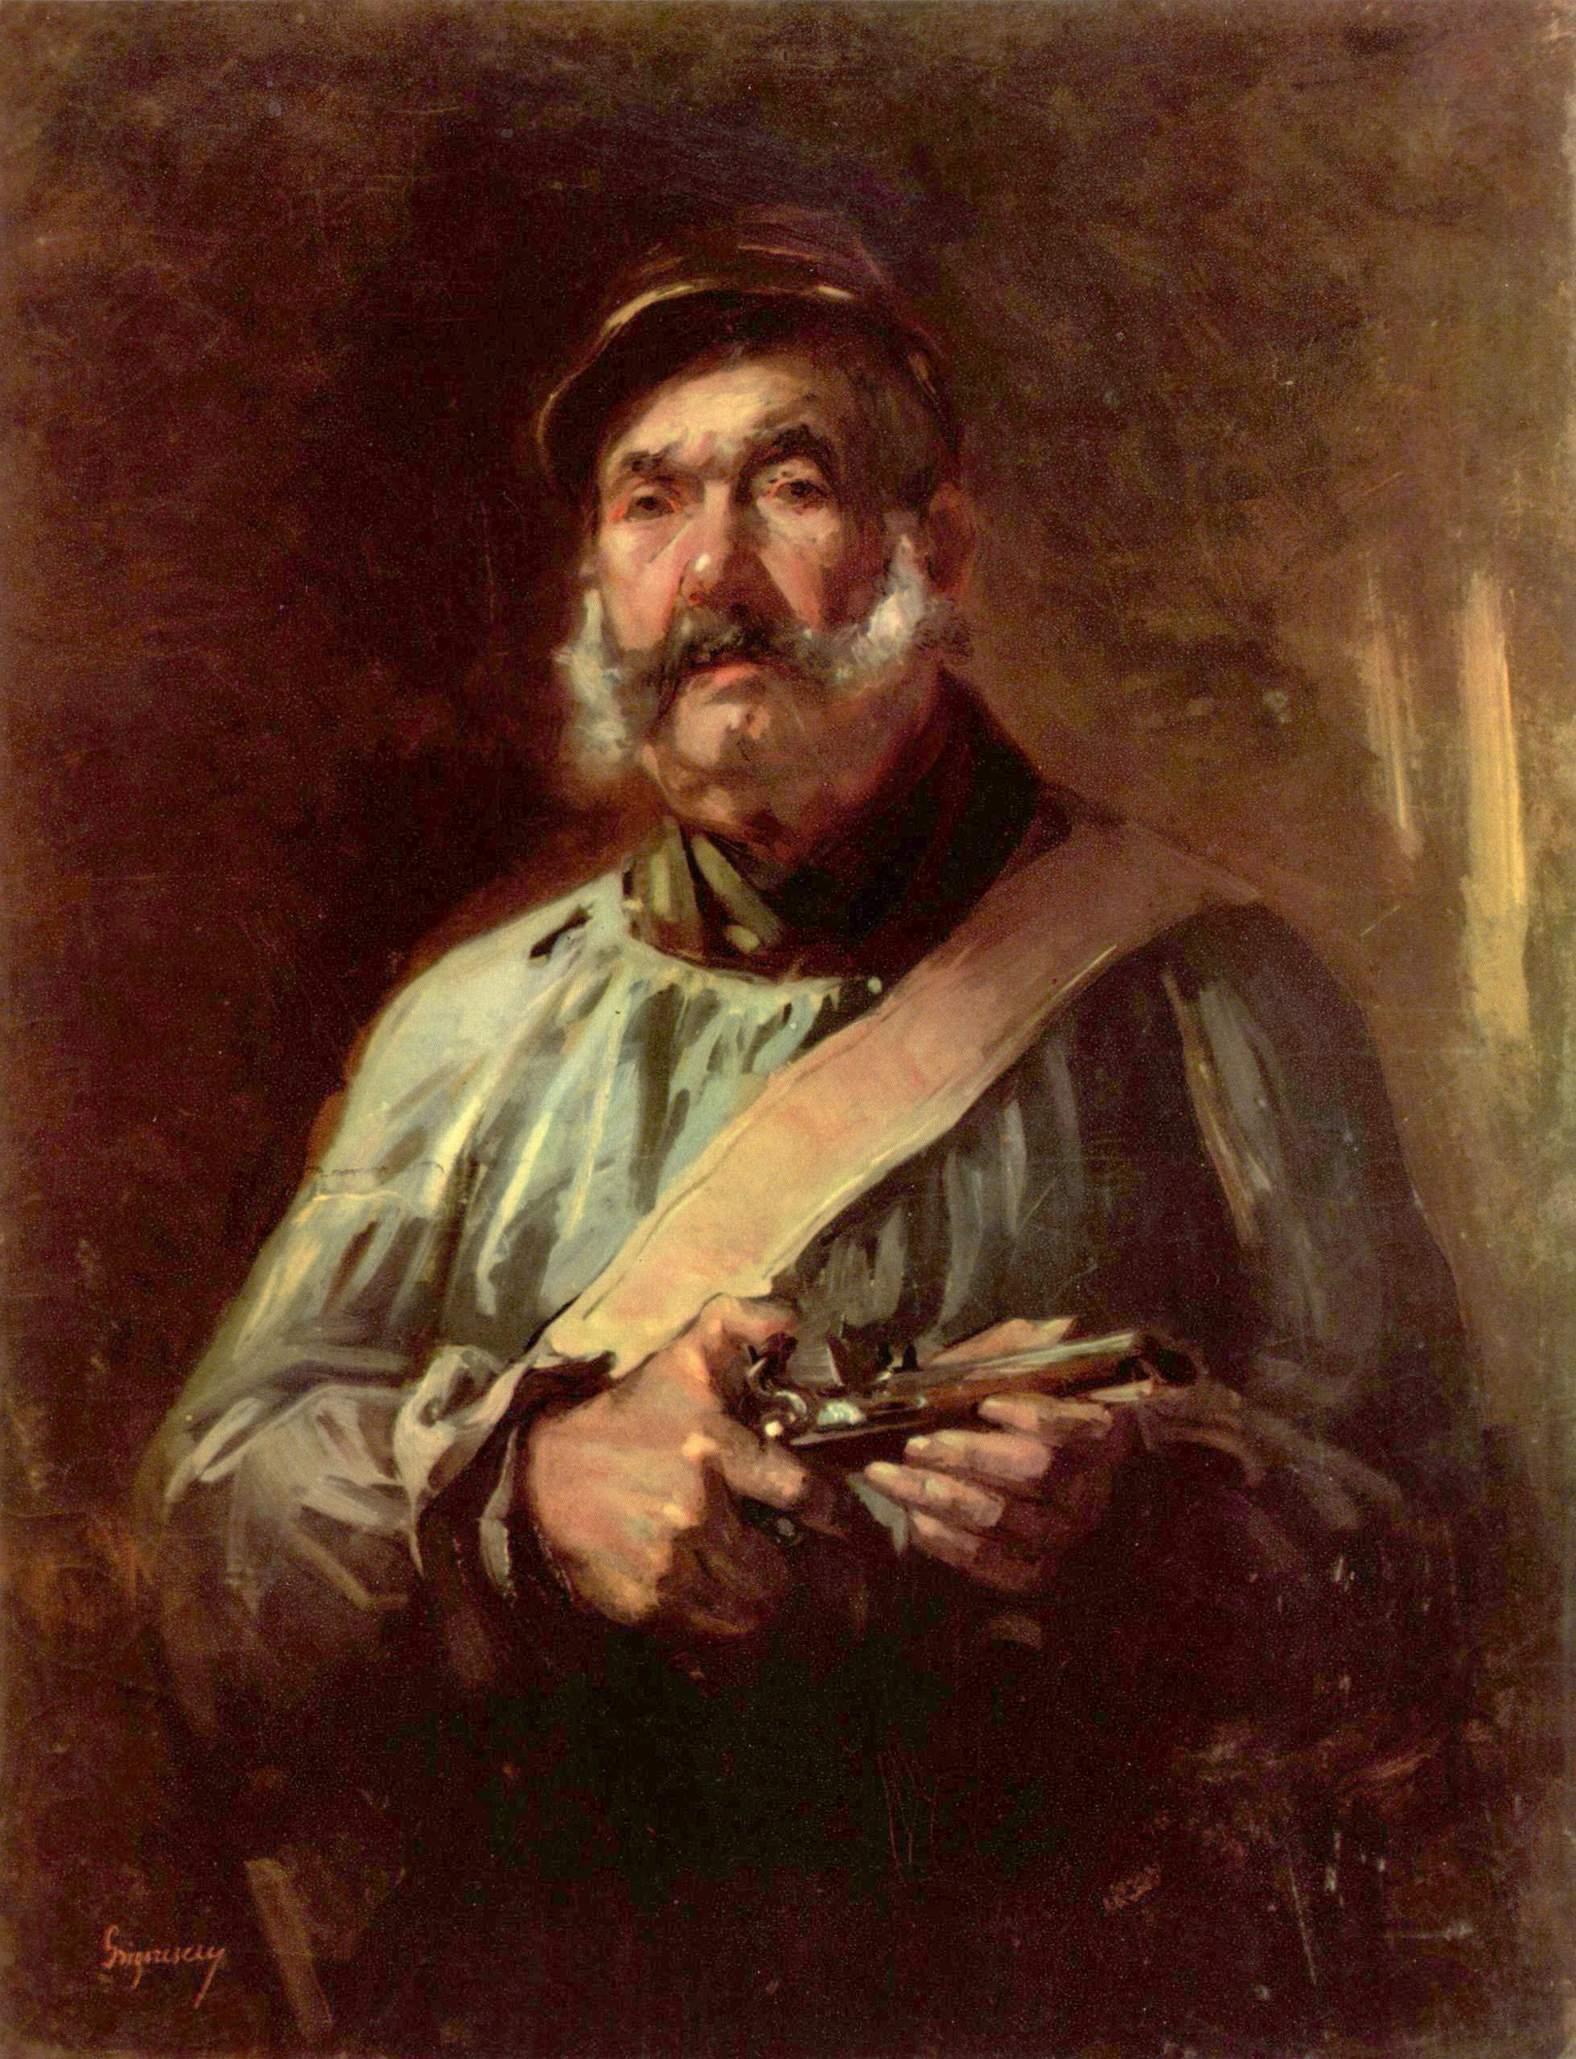 Original file      1 576   215  2 059 pixels  file size  361 KB  MIME type    Nicolae Grigorescu Paintings